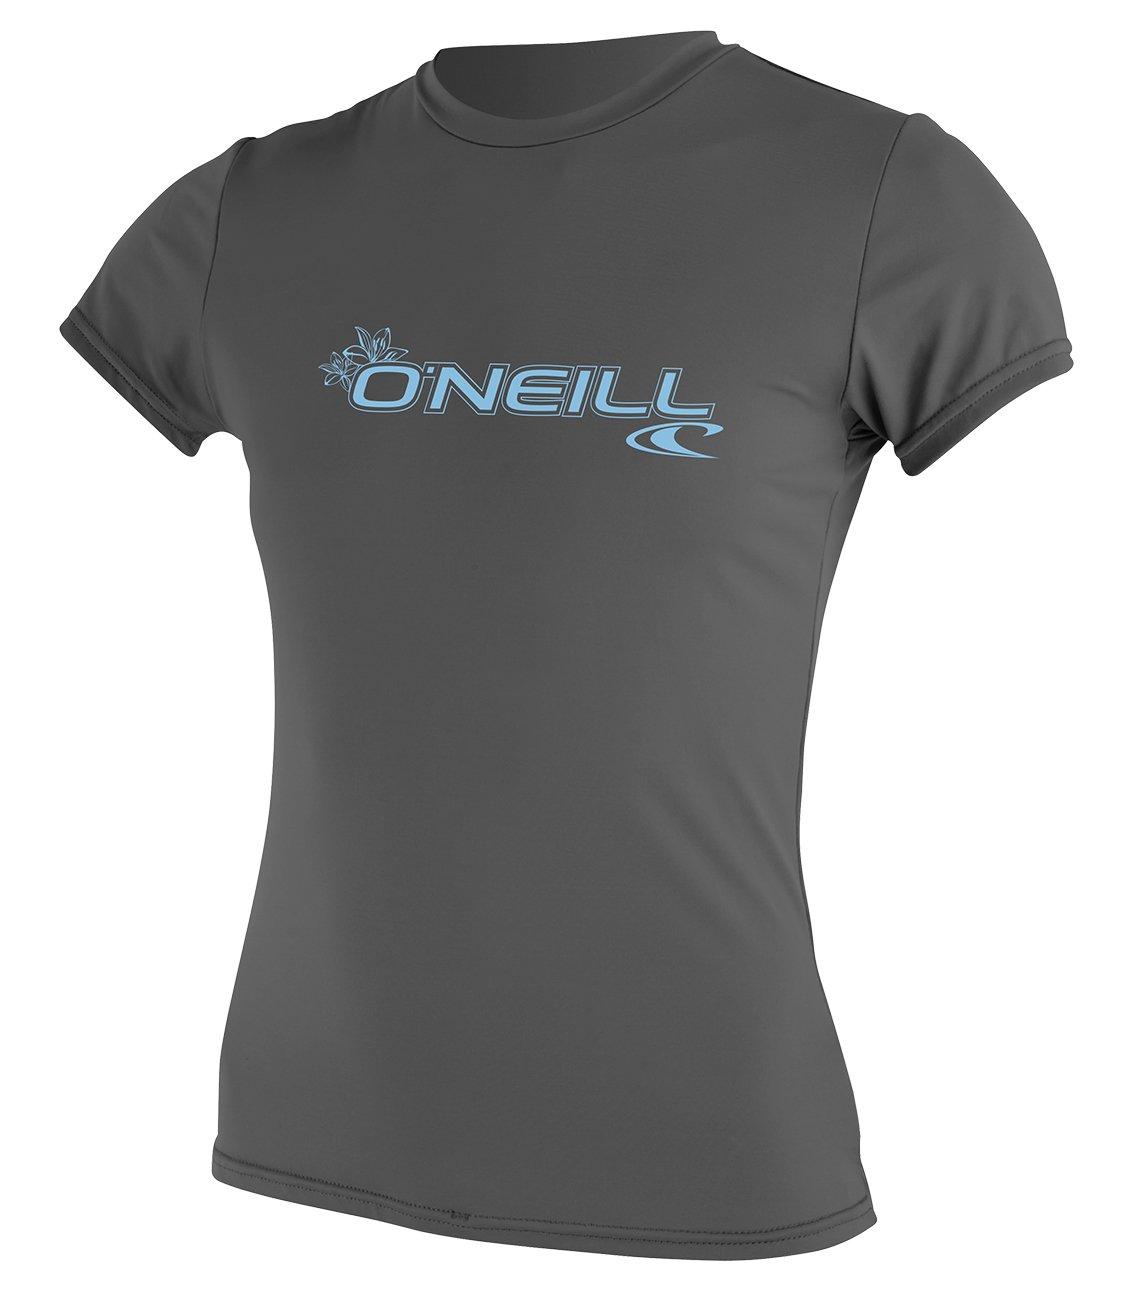 O'Neill Wetsuits Women's Basic Skins Upf 50+ Short Sleeve Sun Shirt, Graphite, X-Small